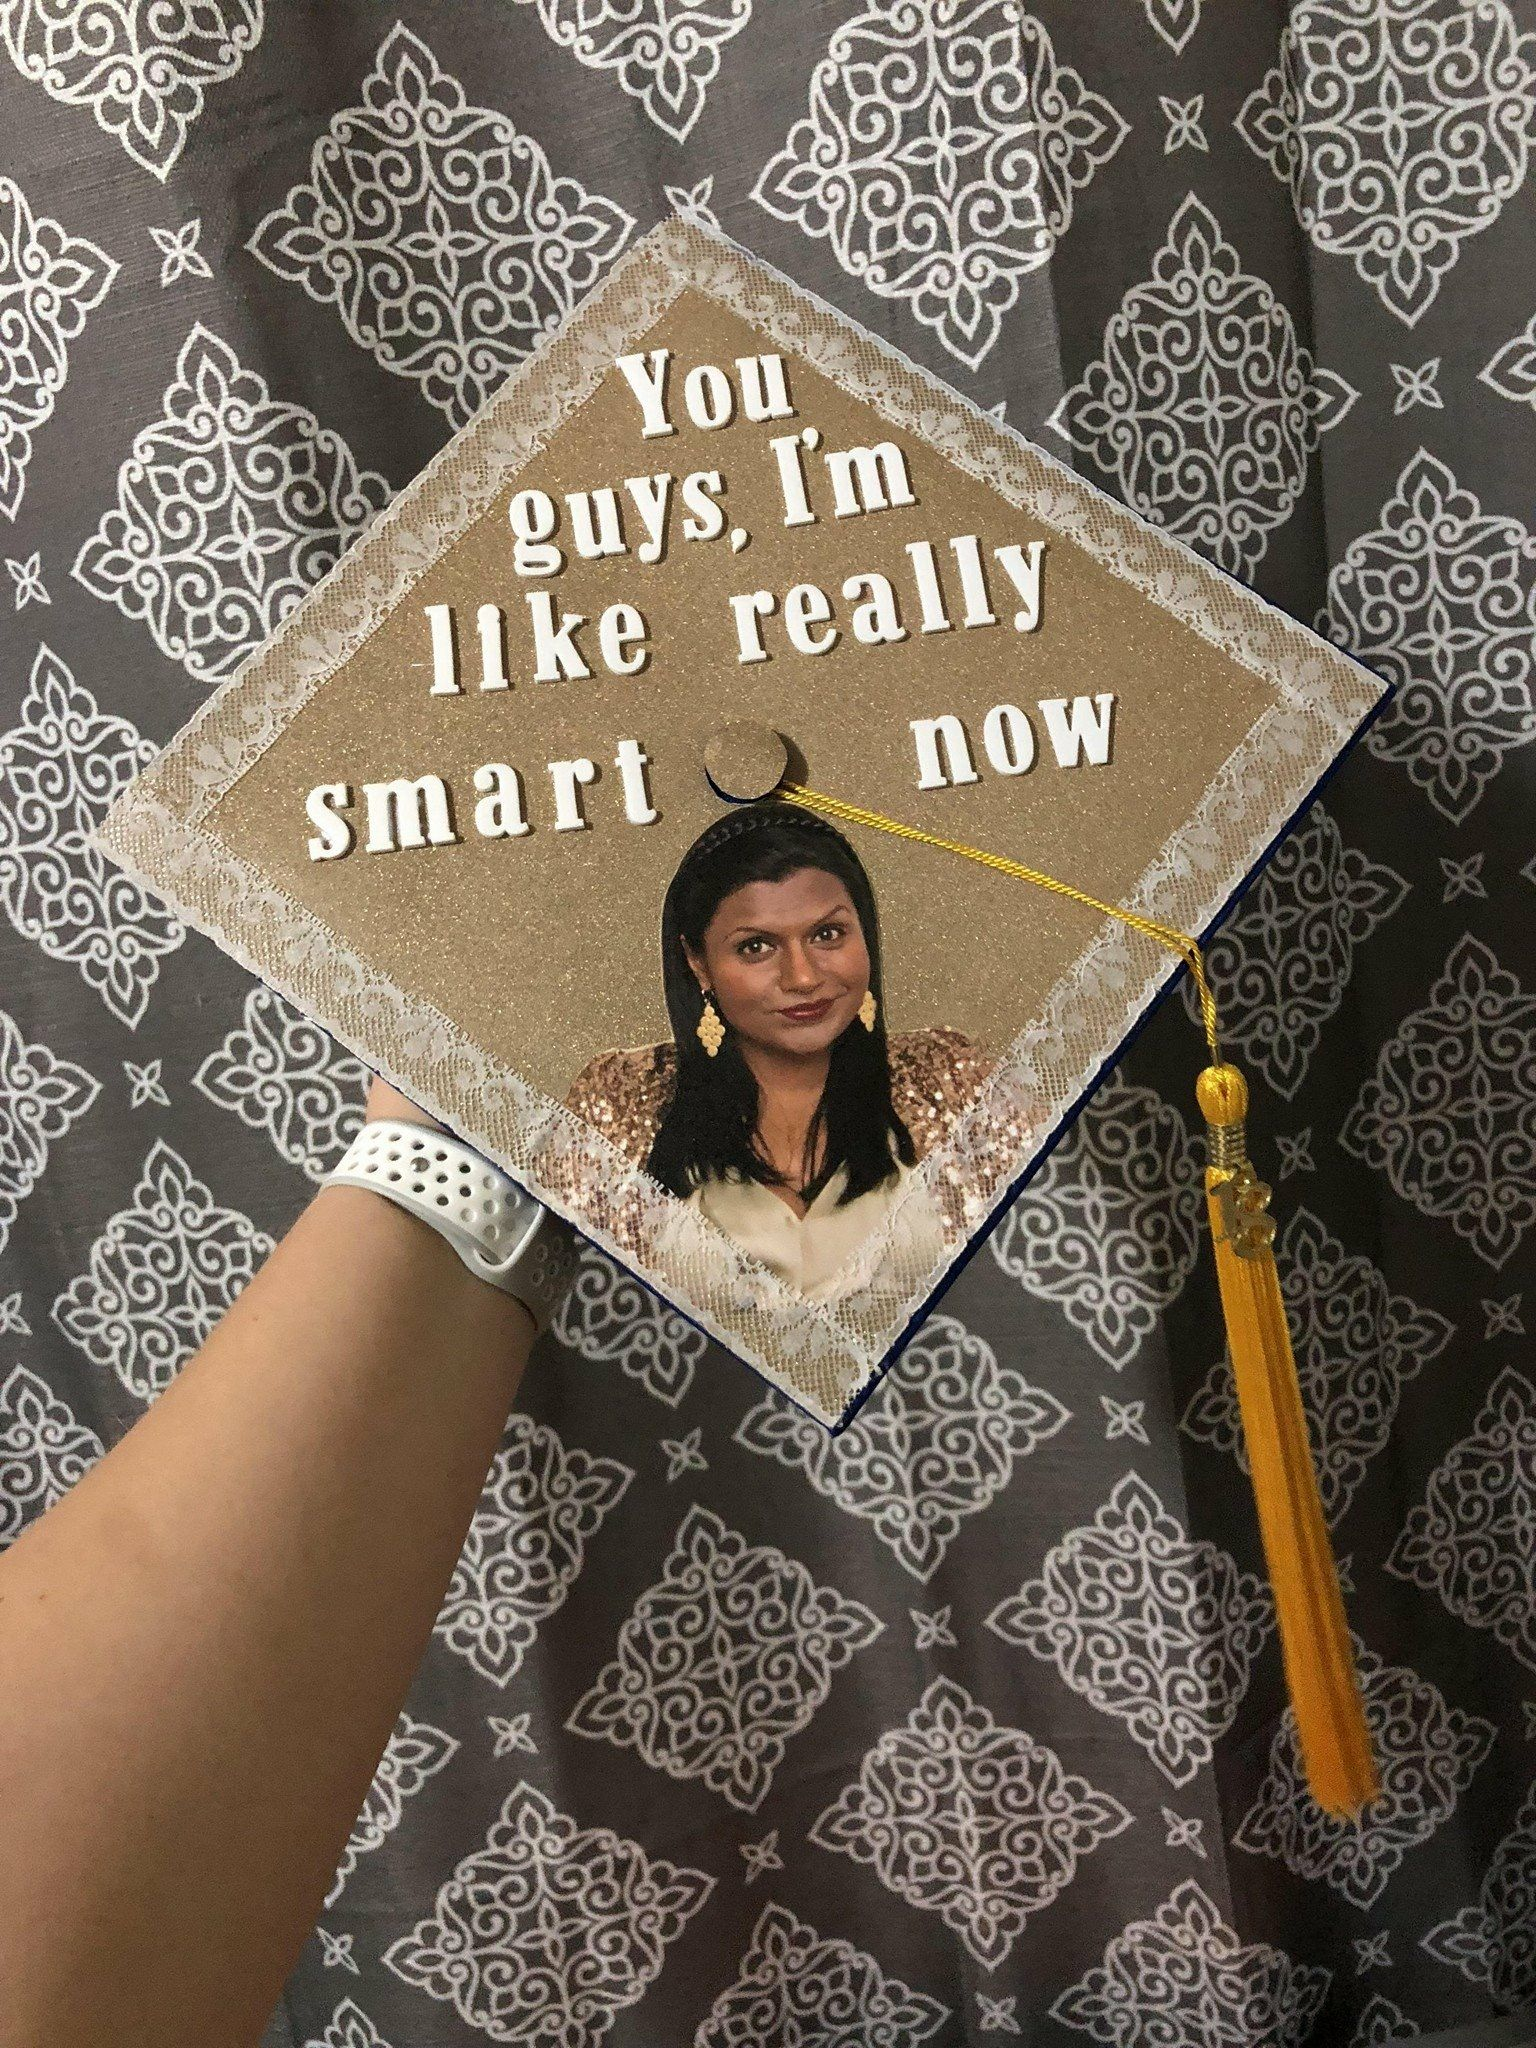 Grad Cap Graduation Cap Decoration College Grad Cap Ideas College Graduation Cap